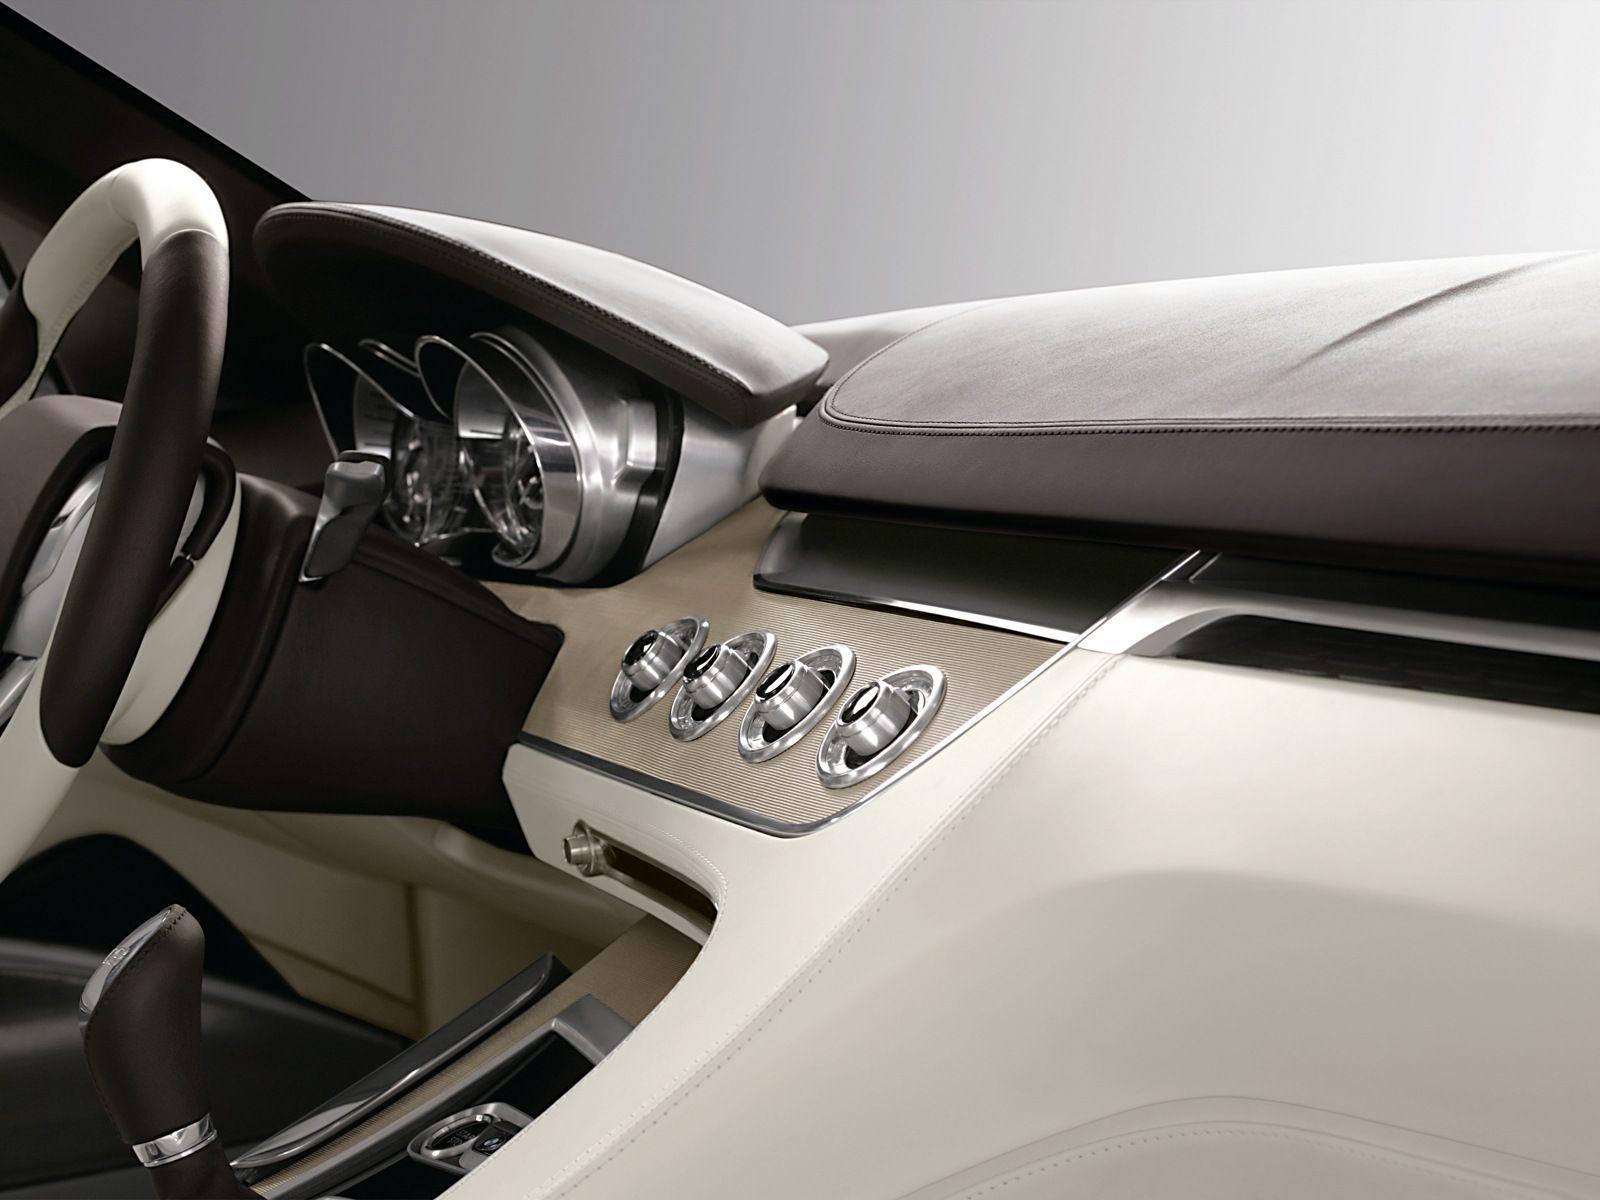 BMW CS Concept | Cars // Interior | Pinterest | BMW, Cars and Car ...